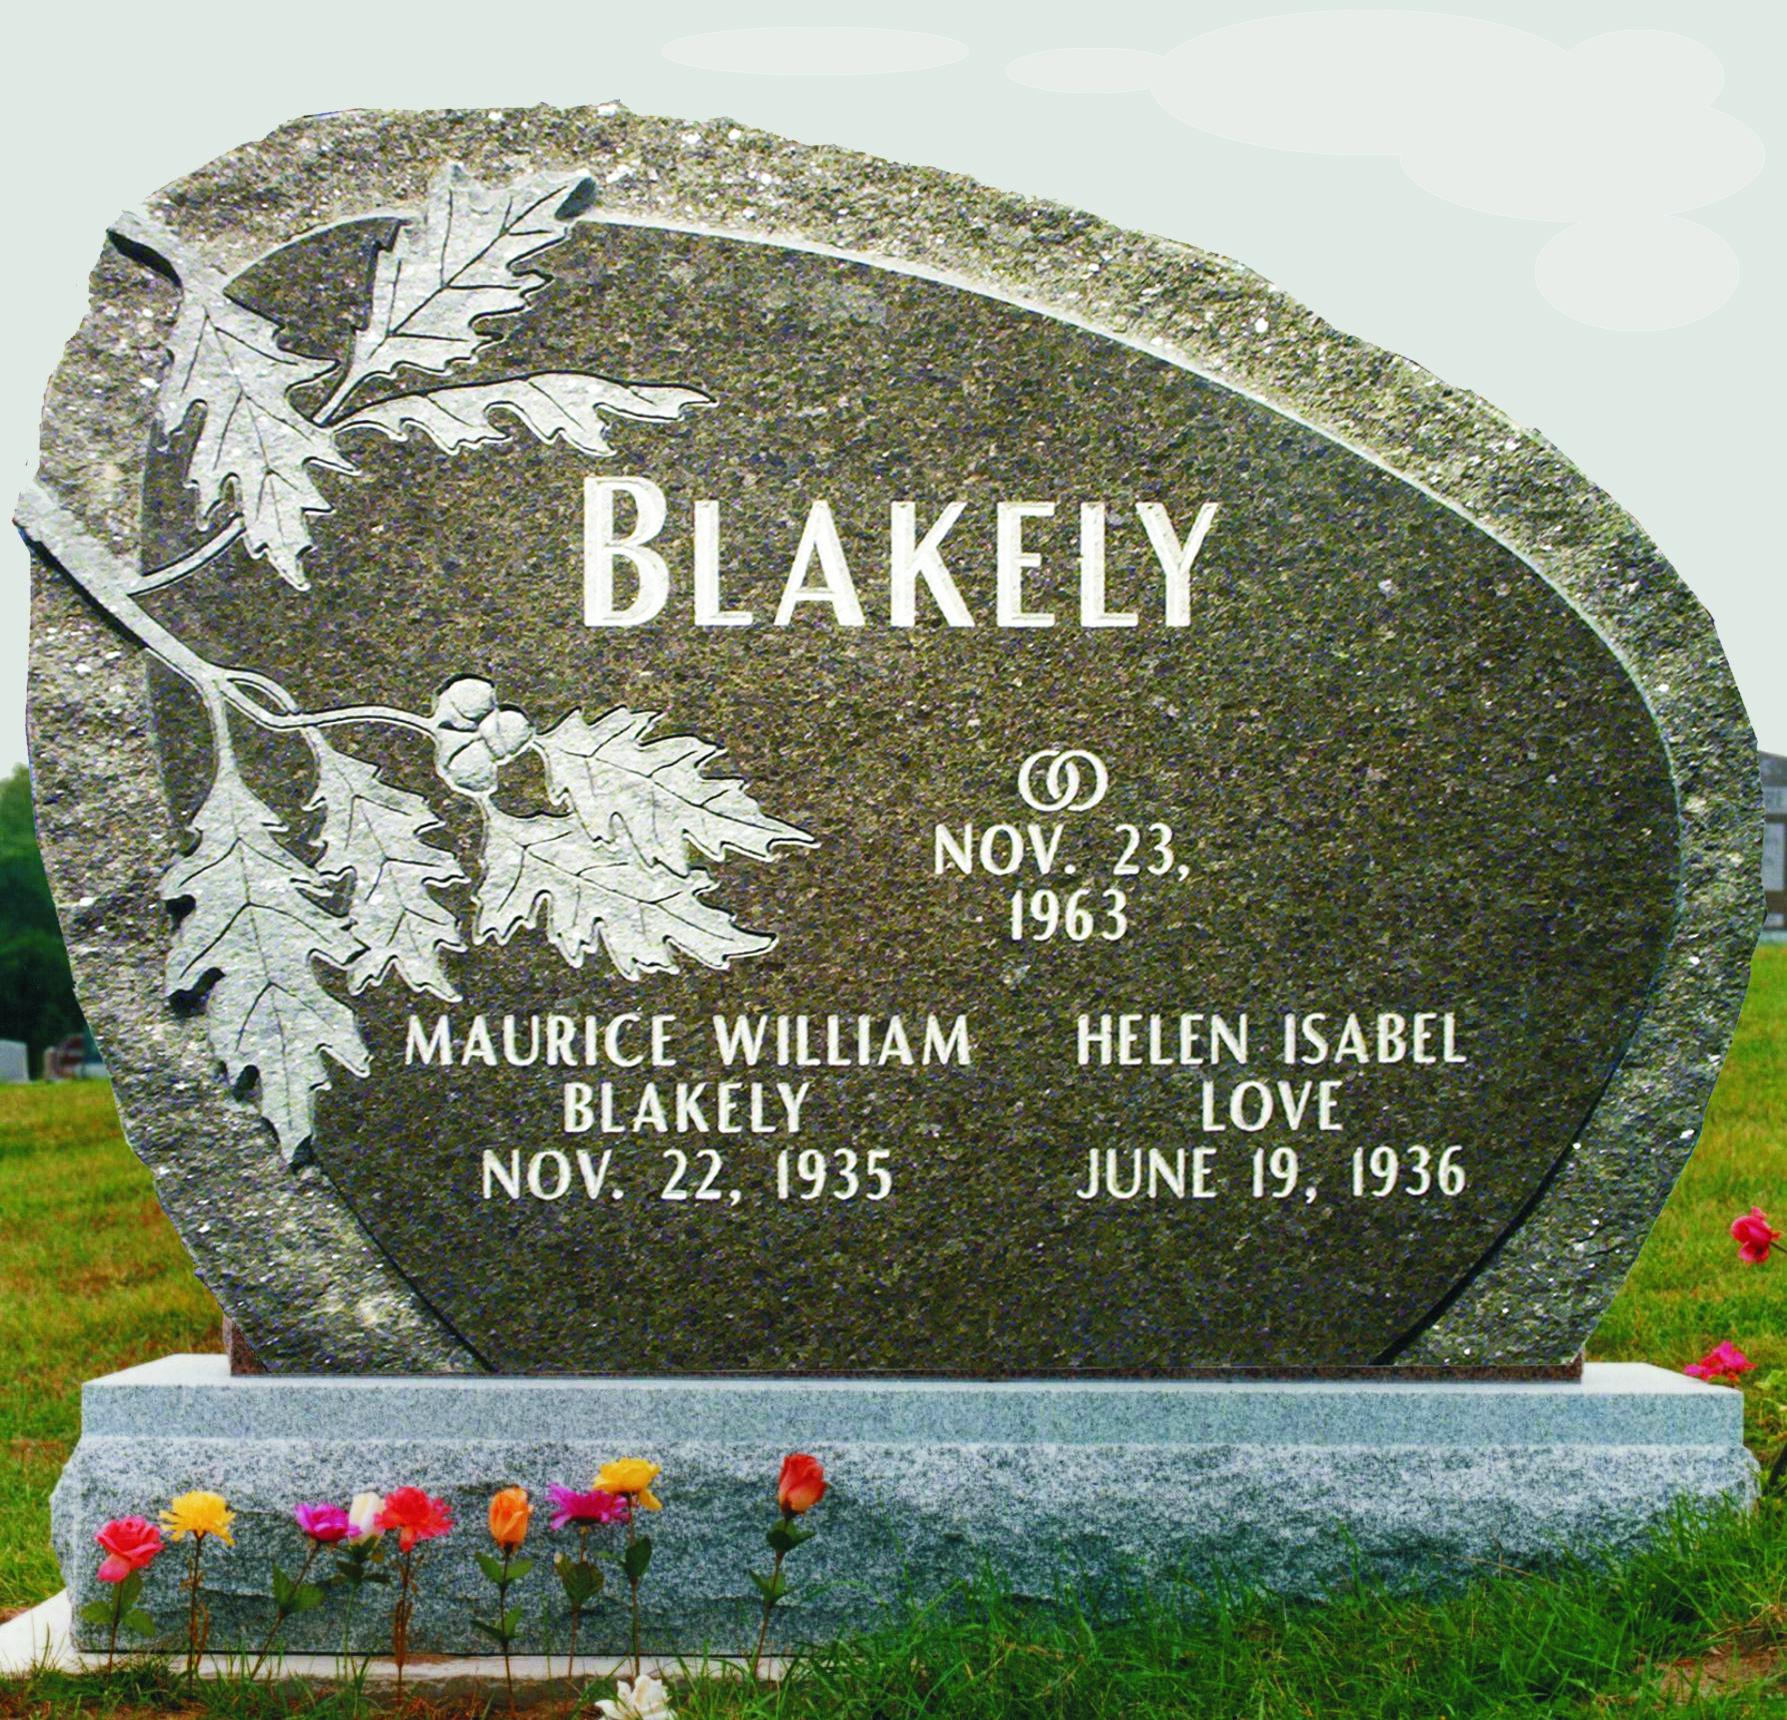 Blakely